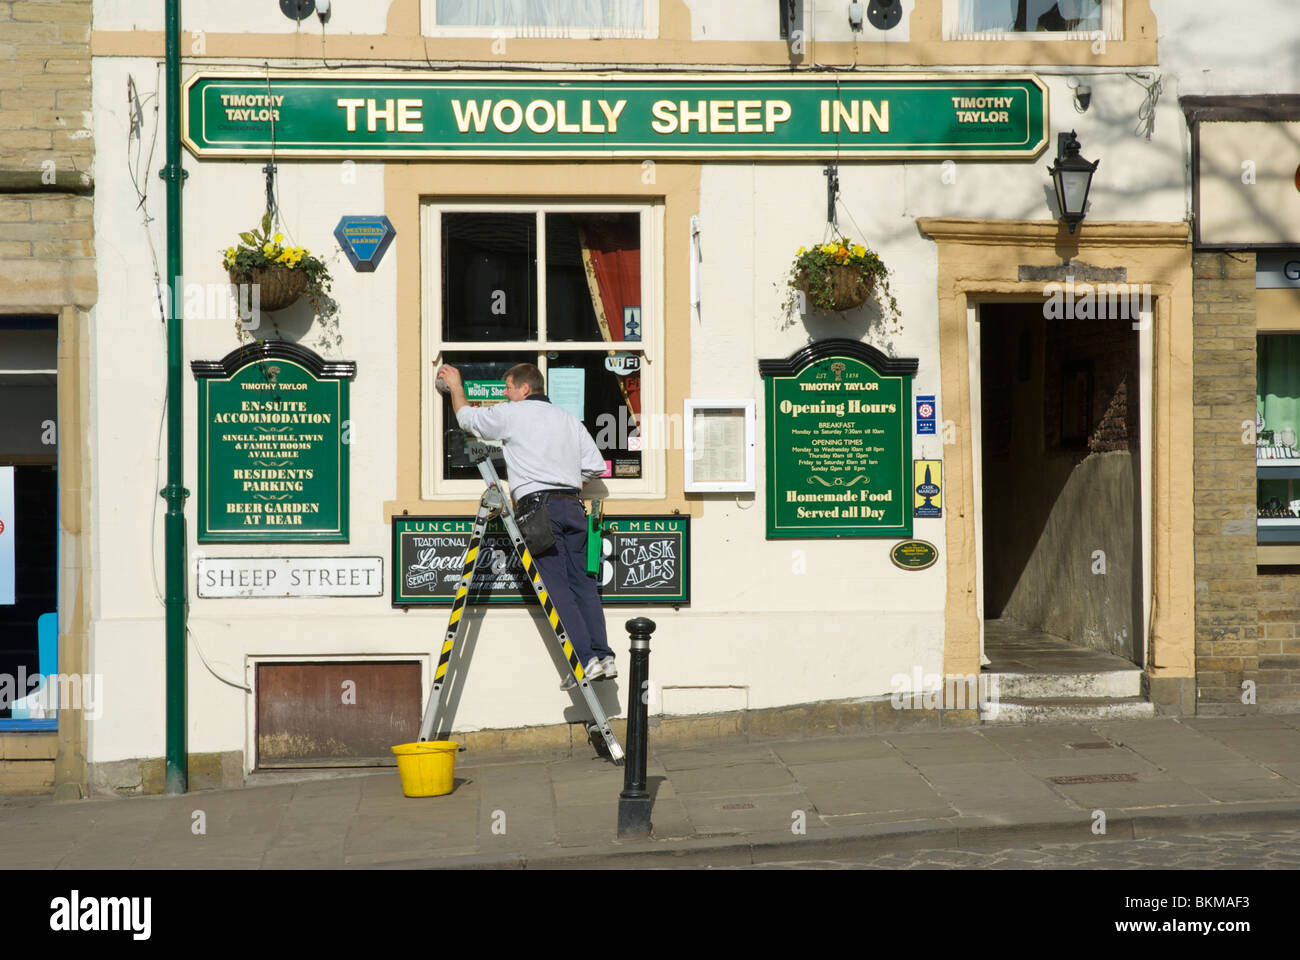 Man washing windows of the Woolly Sheep Inn, on Sheep Street, Skipton, North Yorkshire, England UK - Stock Image